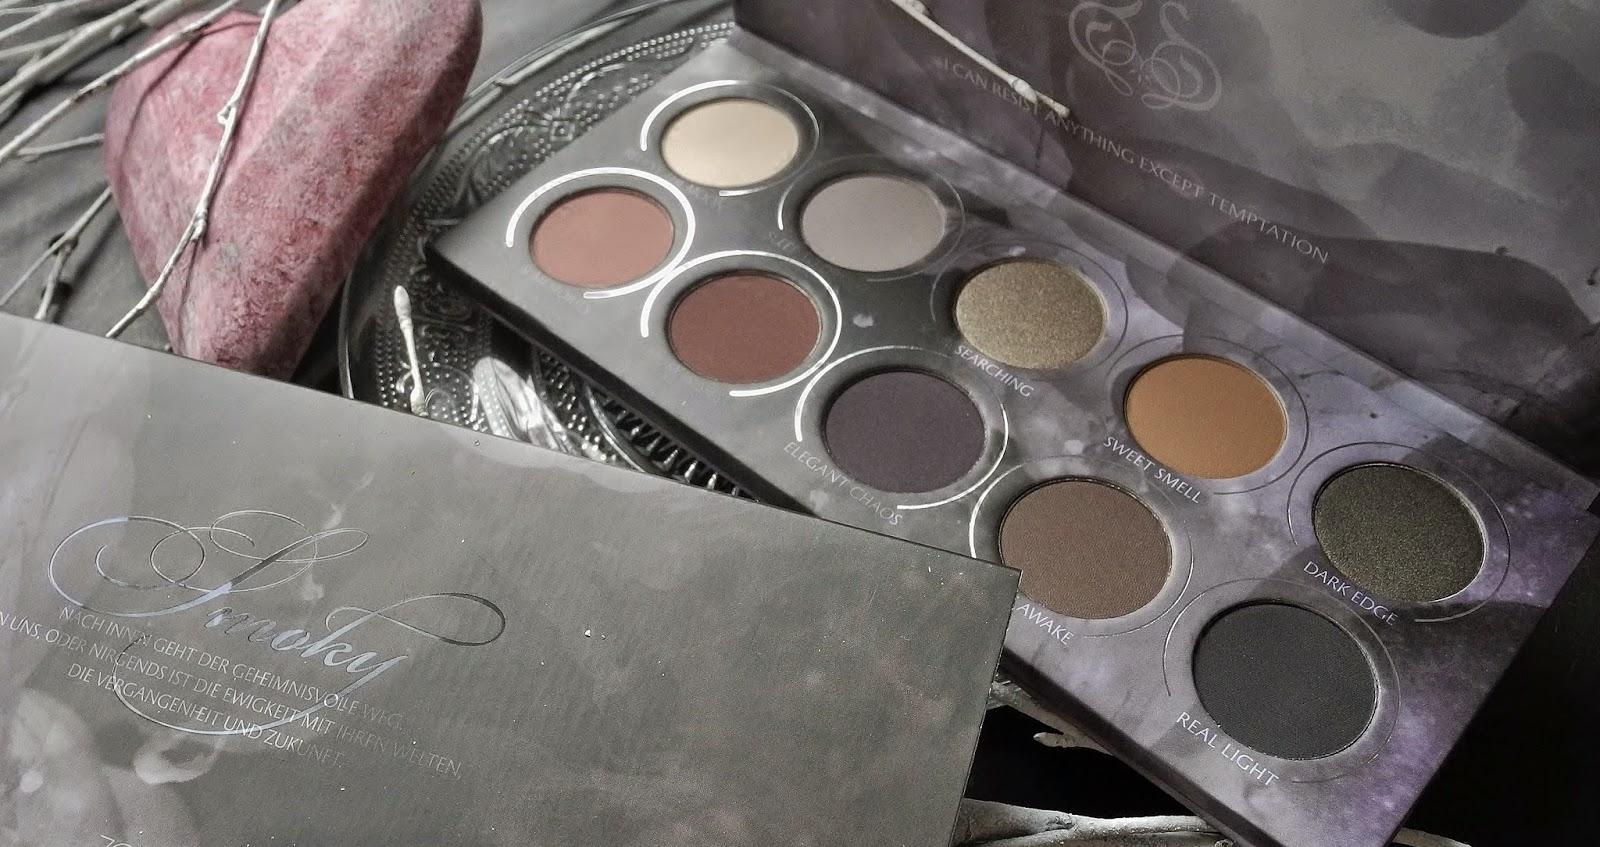 Zoeva Smoky Eyeshadow Palette Review Bubblycolor